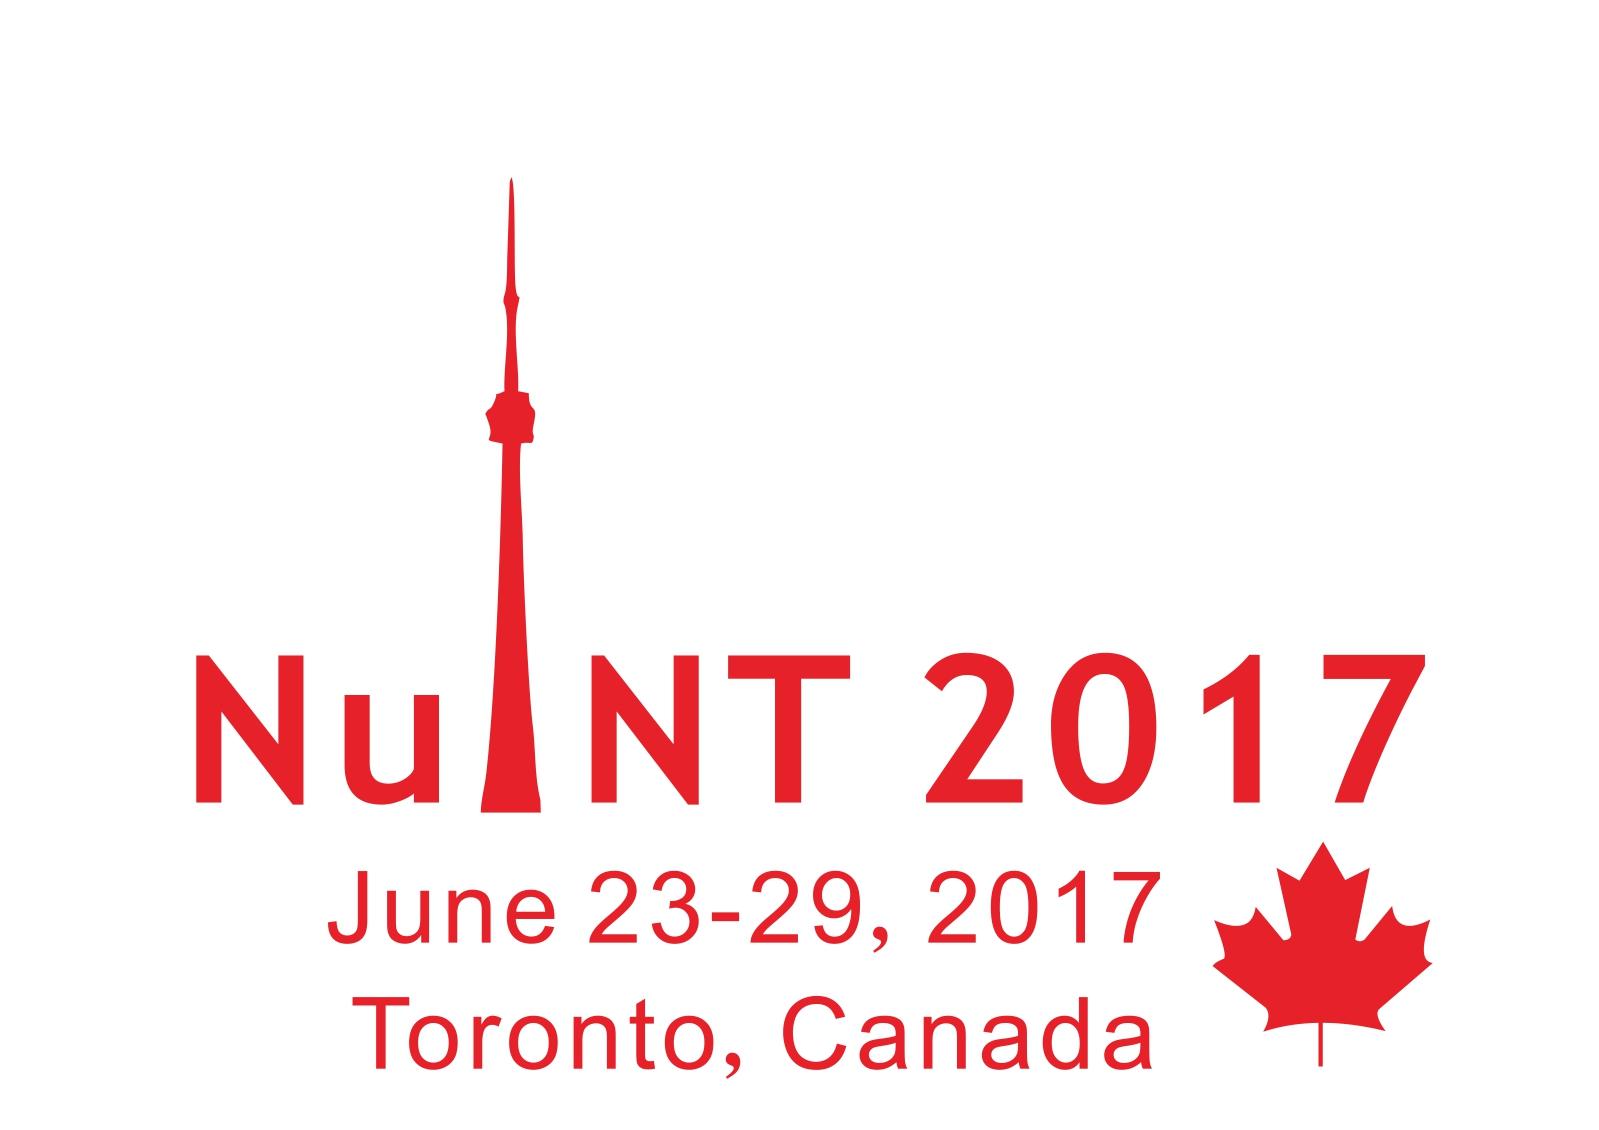 NuINT2017 logo